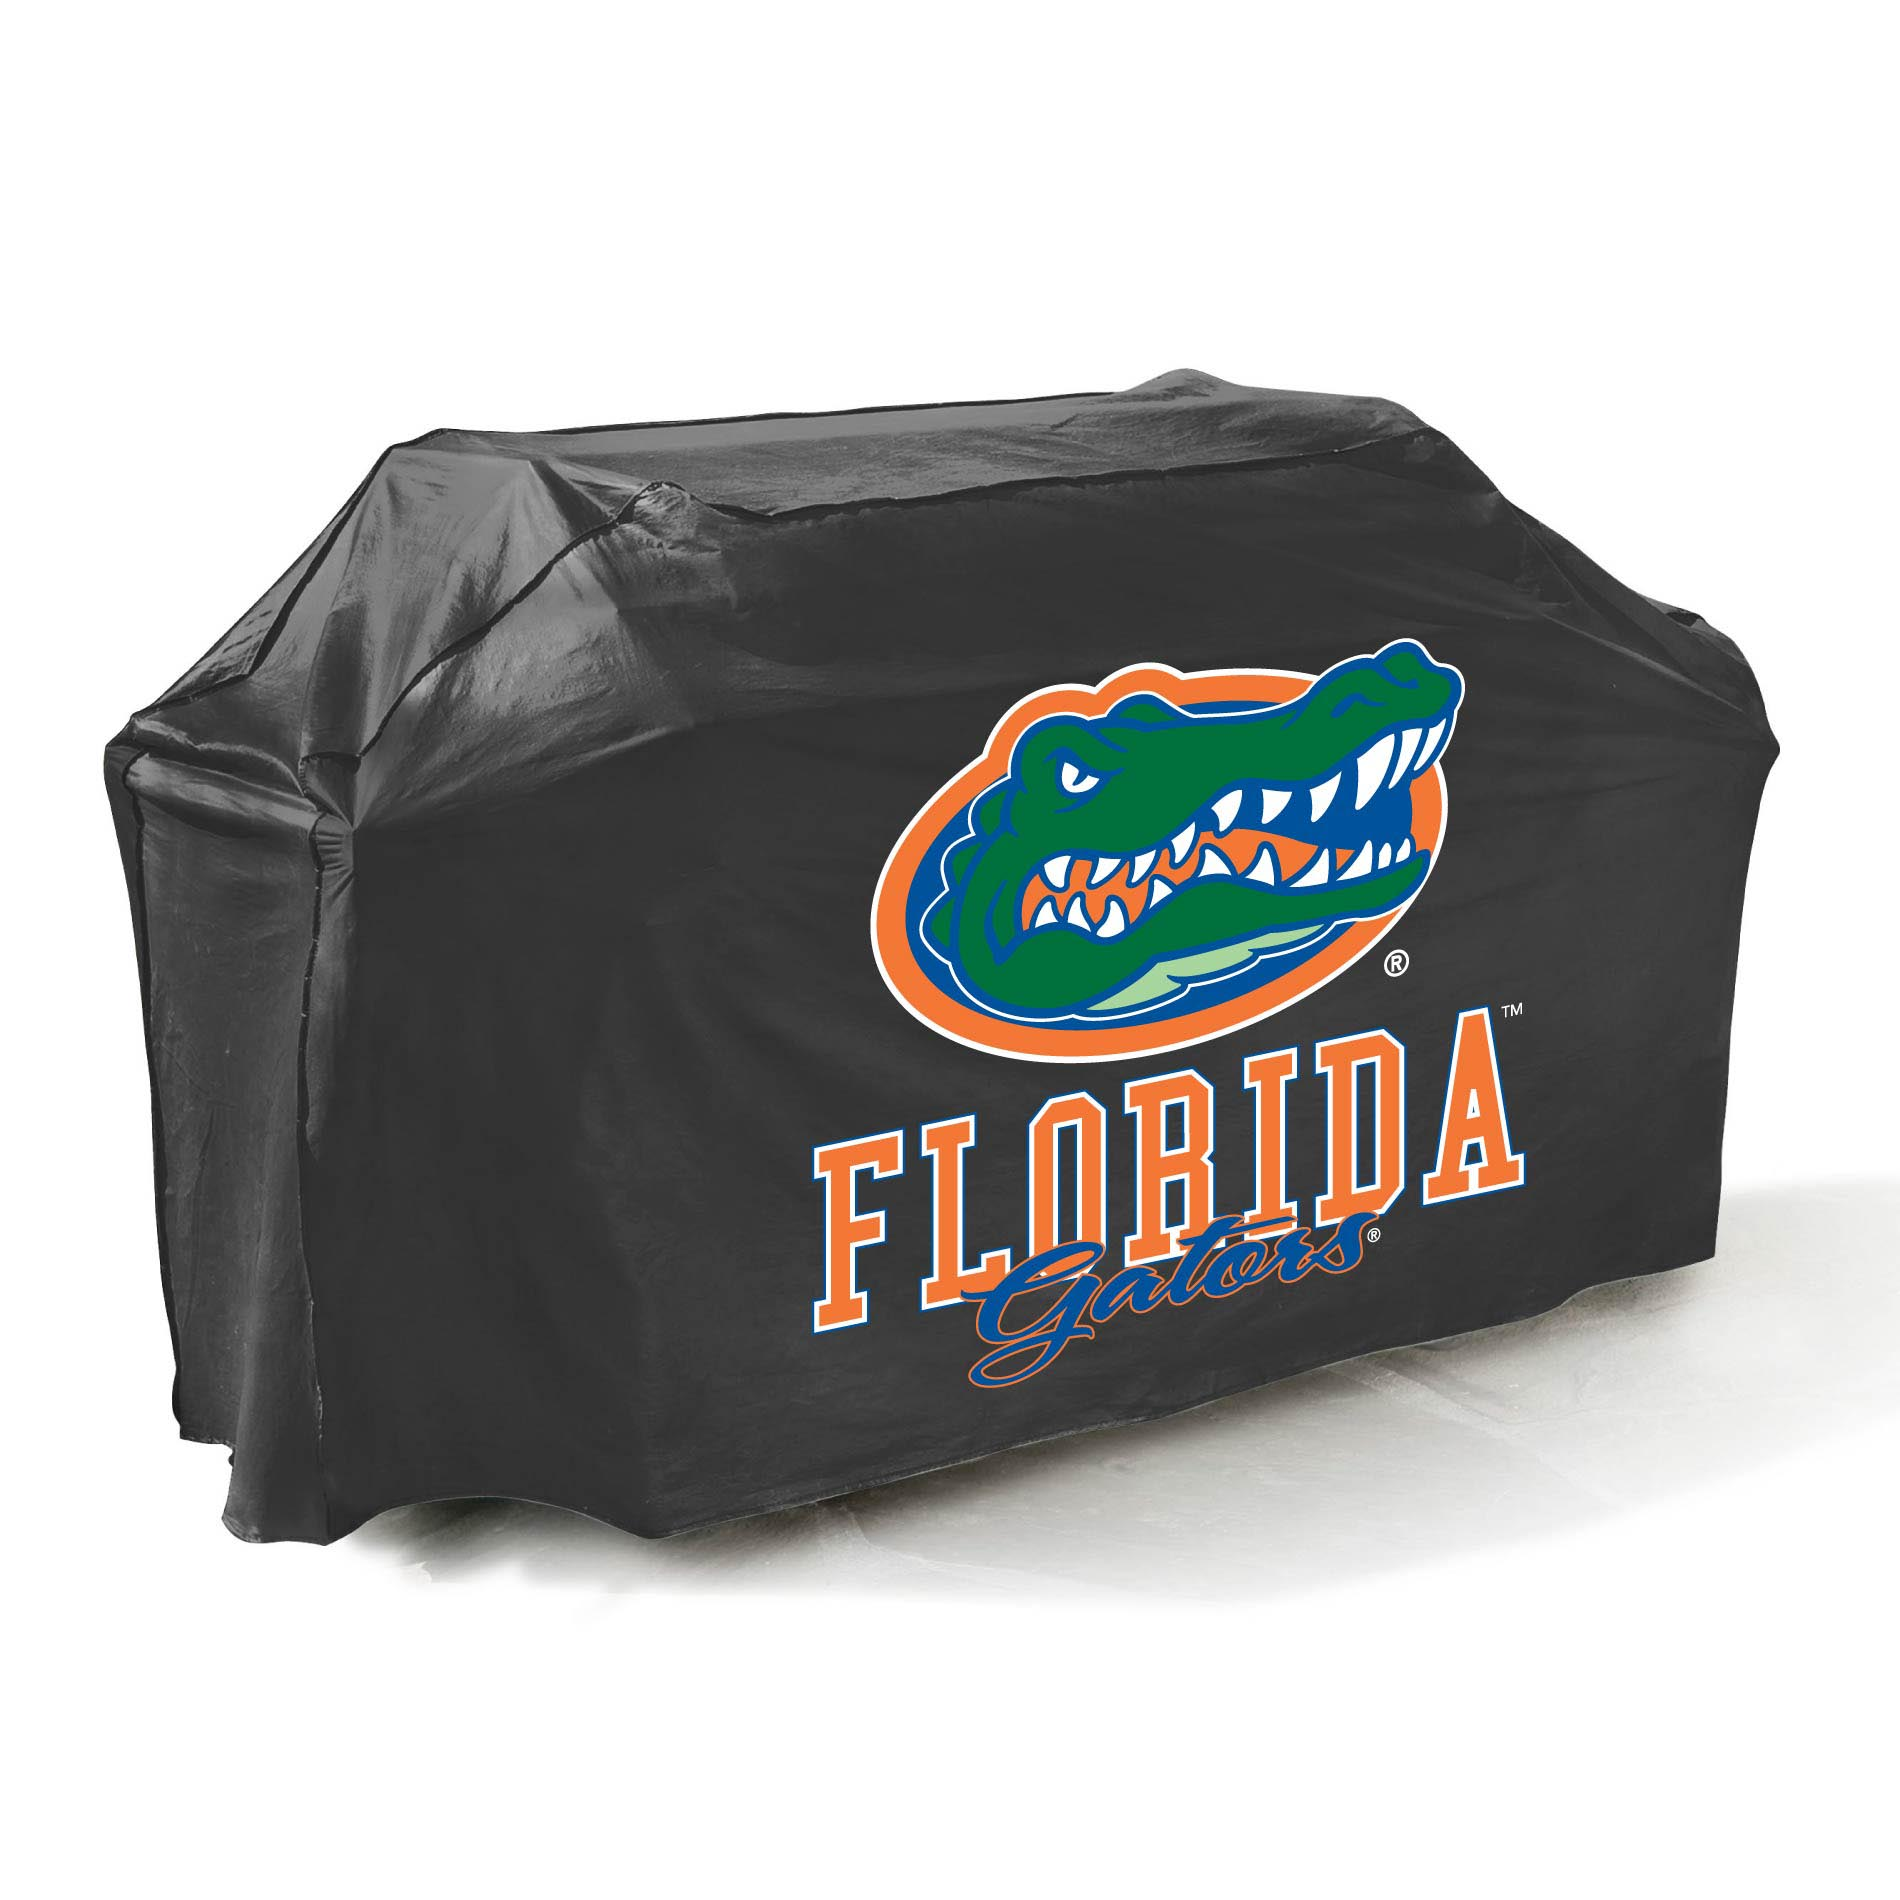 Florida Gators 65-inch Gas Grill Cover